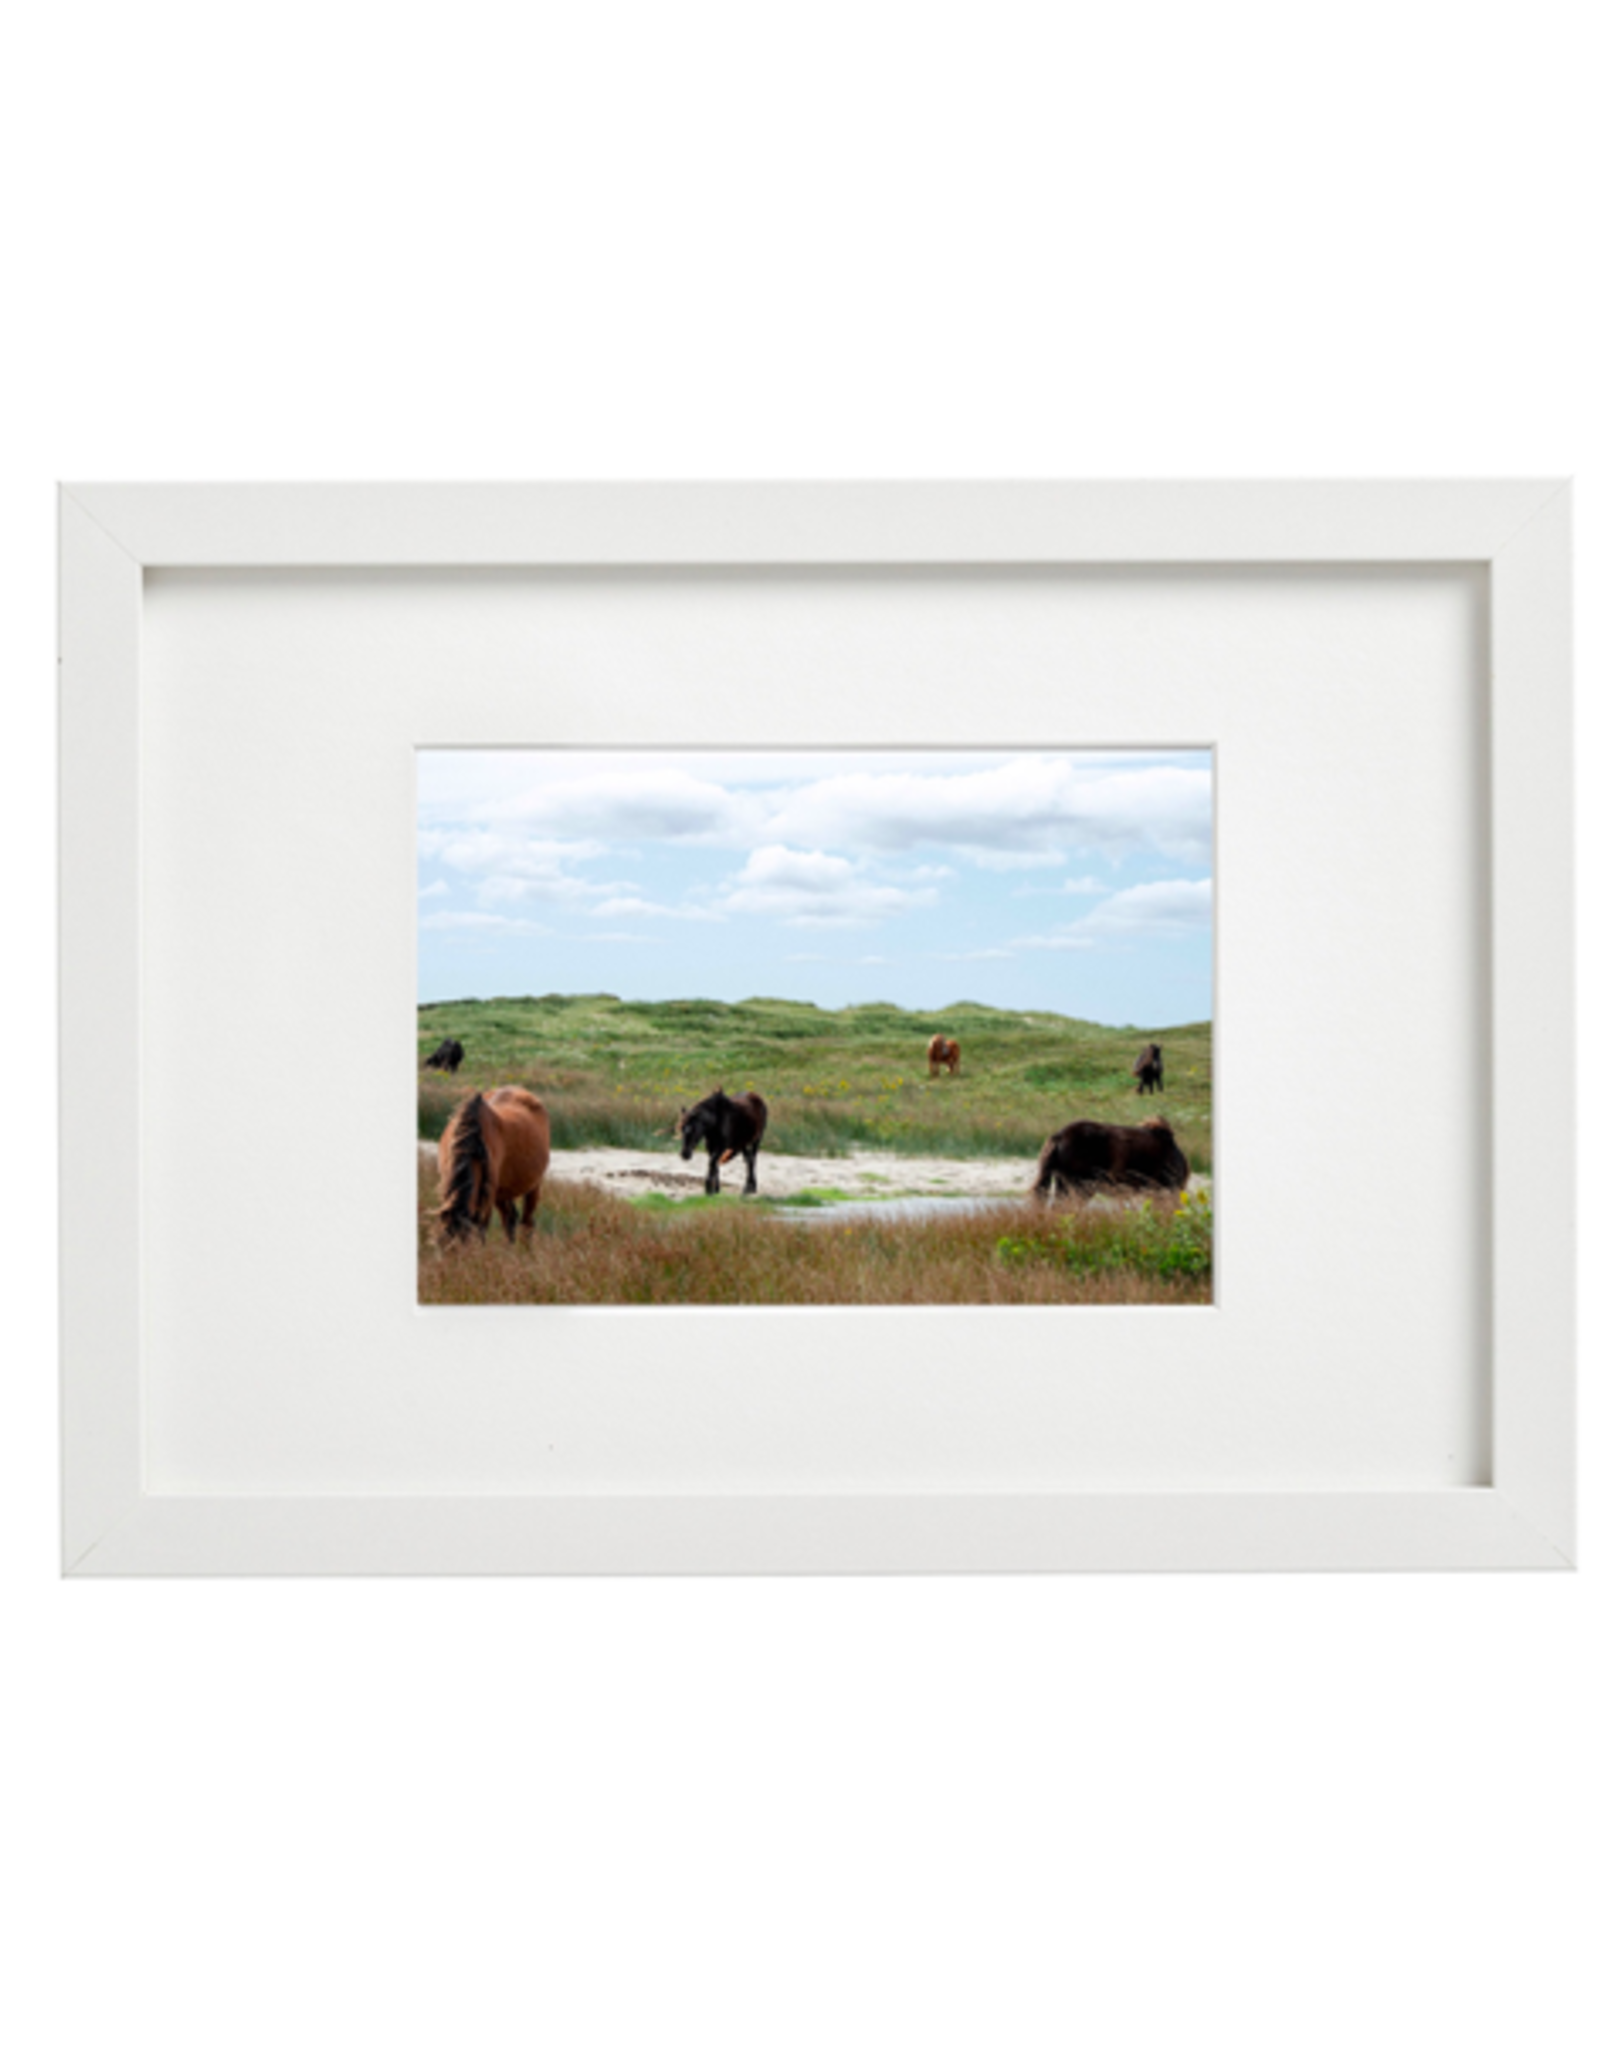 "Aleyah Solomon - Photo Print/Family Gathering Sable Horses 11 x 14"""